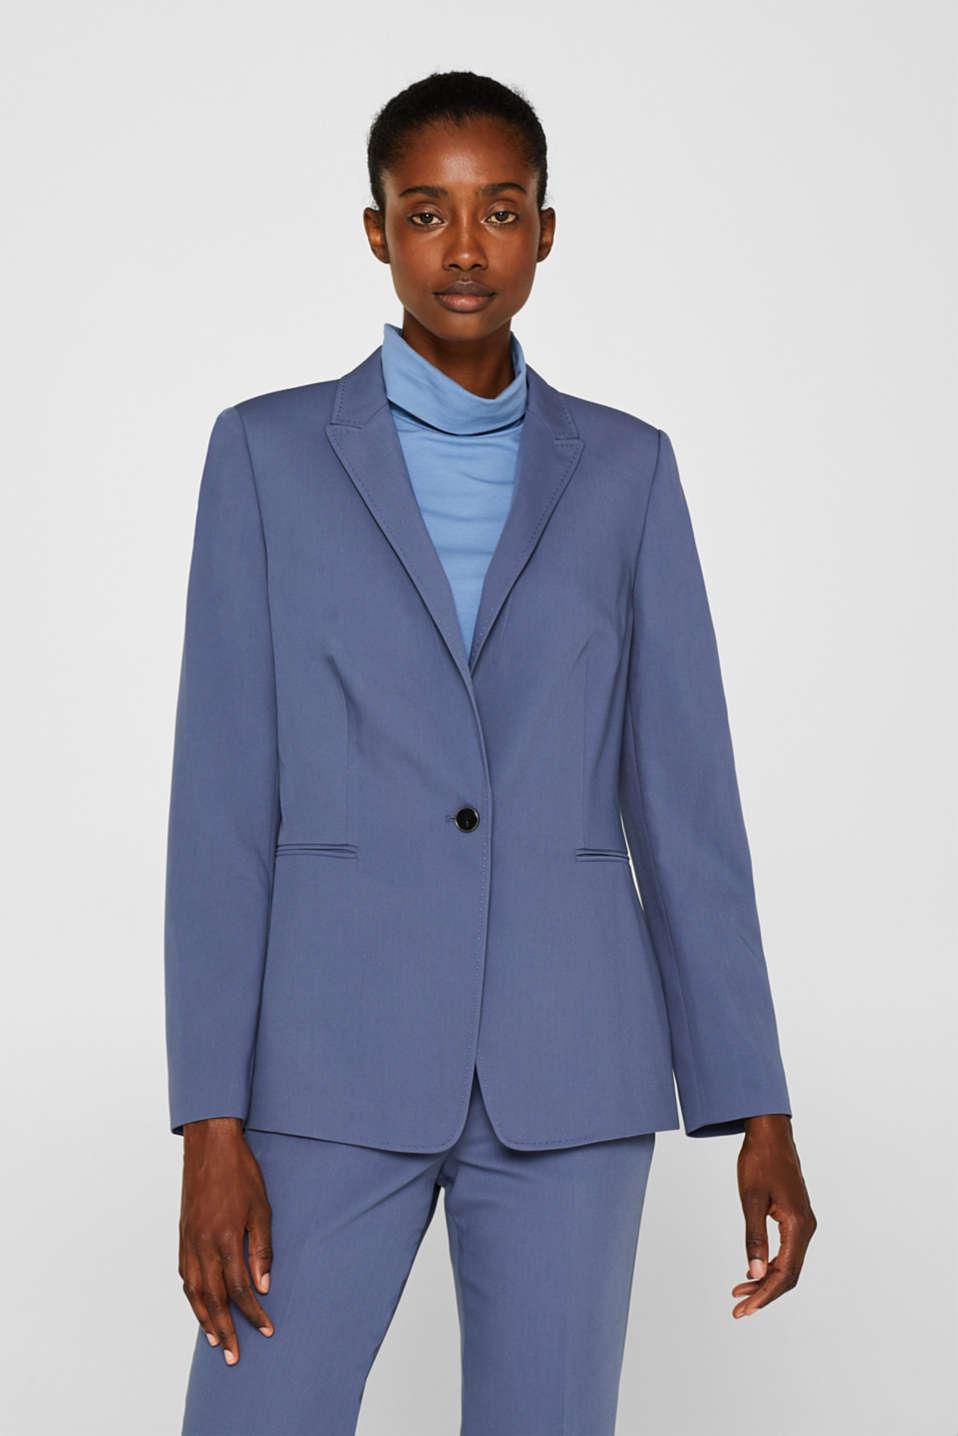 STITCHING mix + match stretch blazer, GREY BLUE 2, detail image number 6